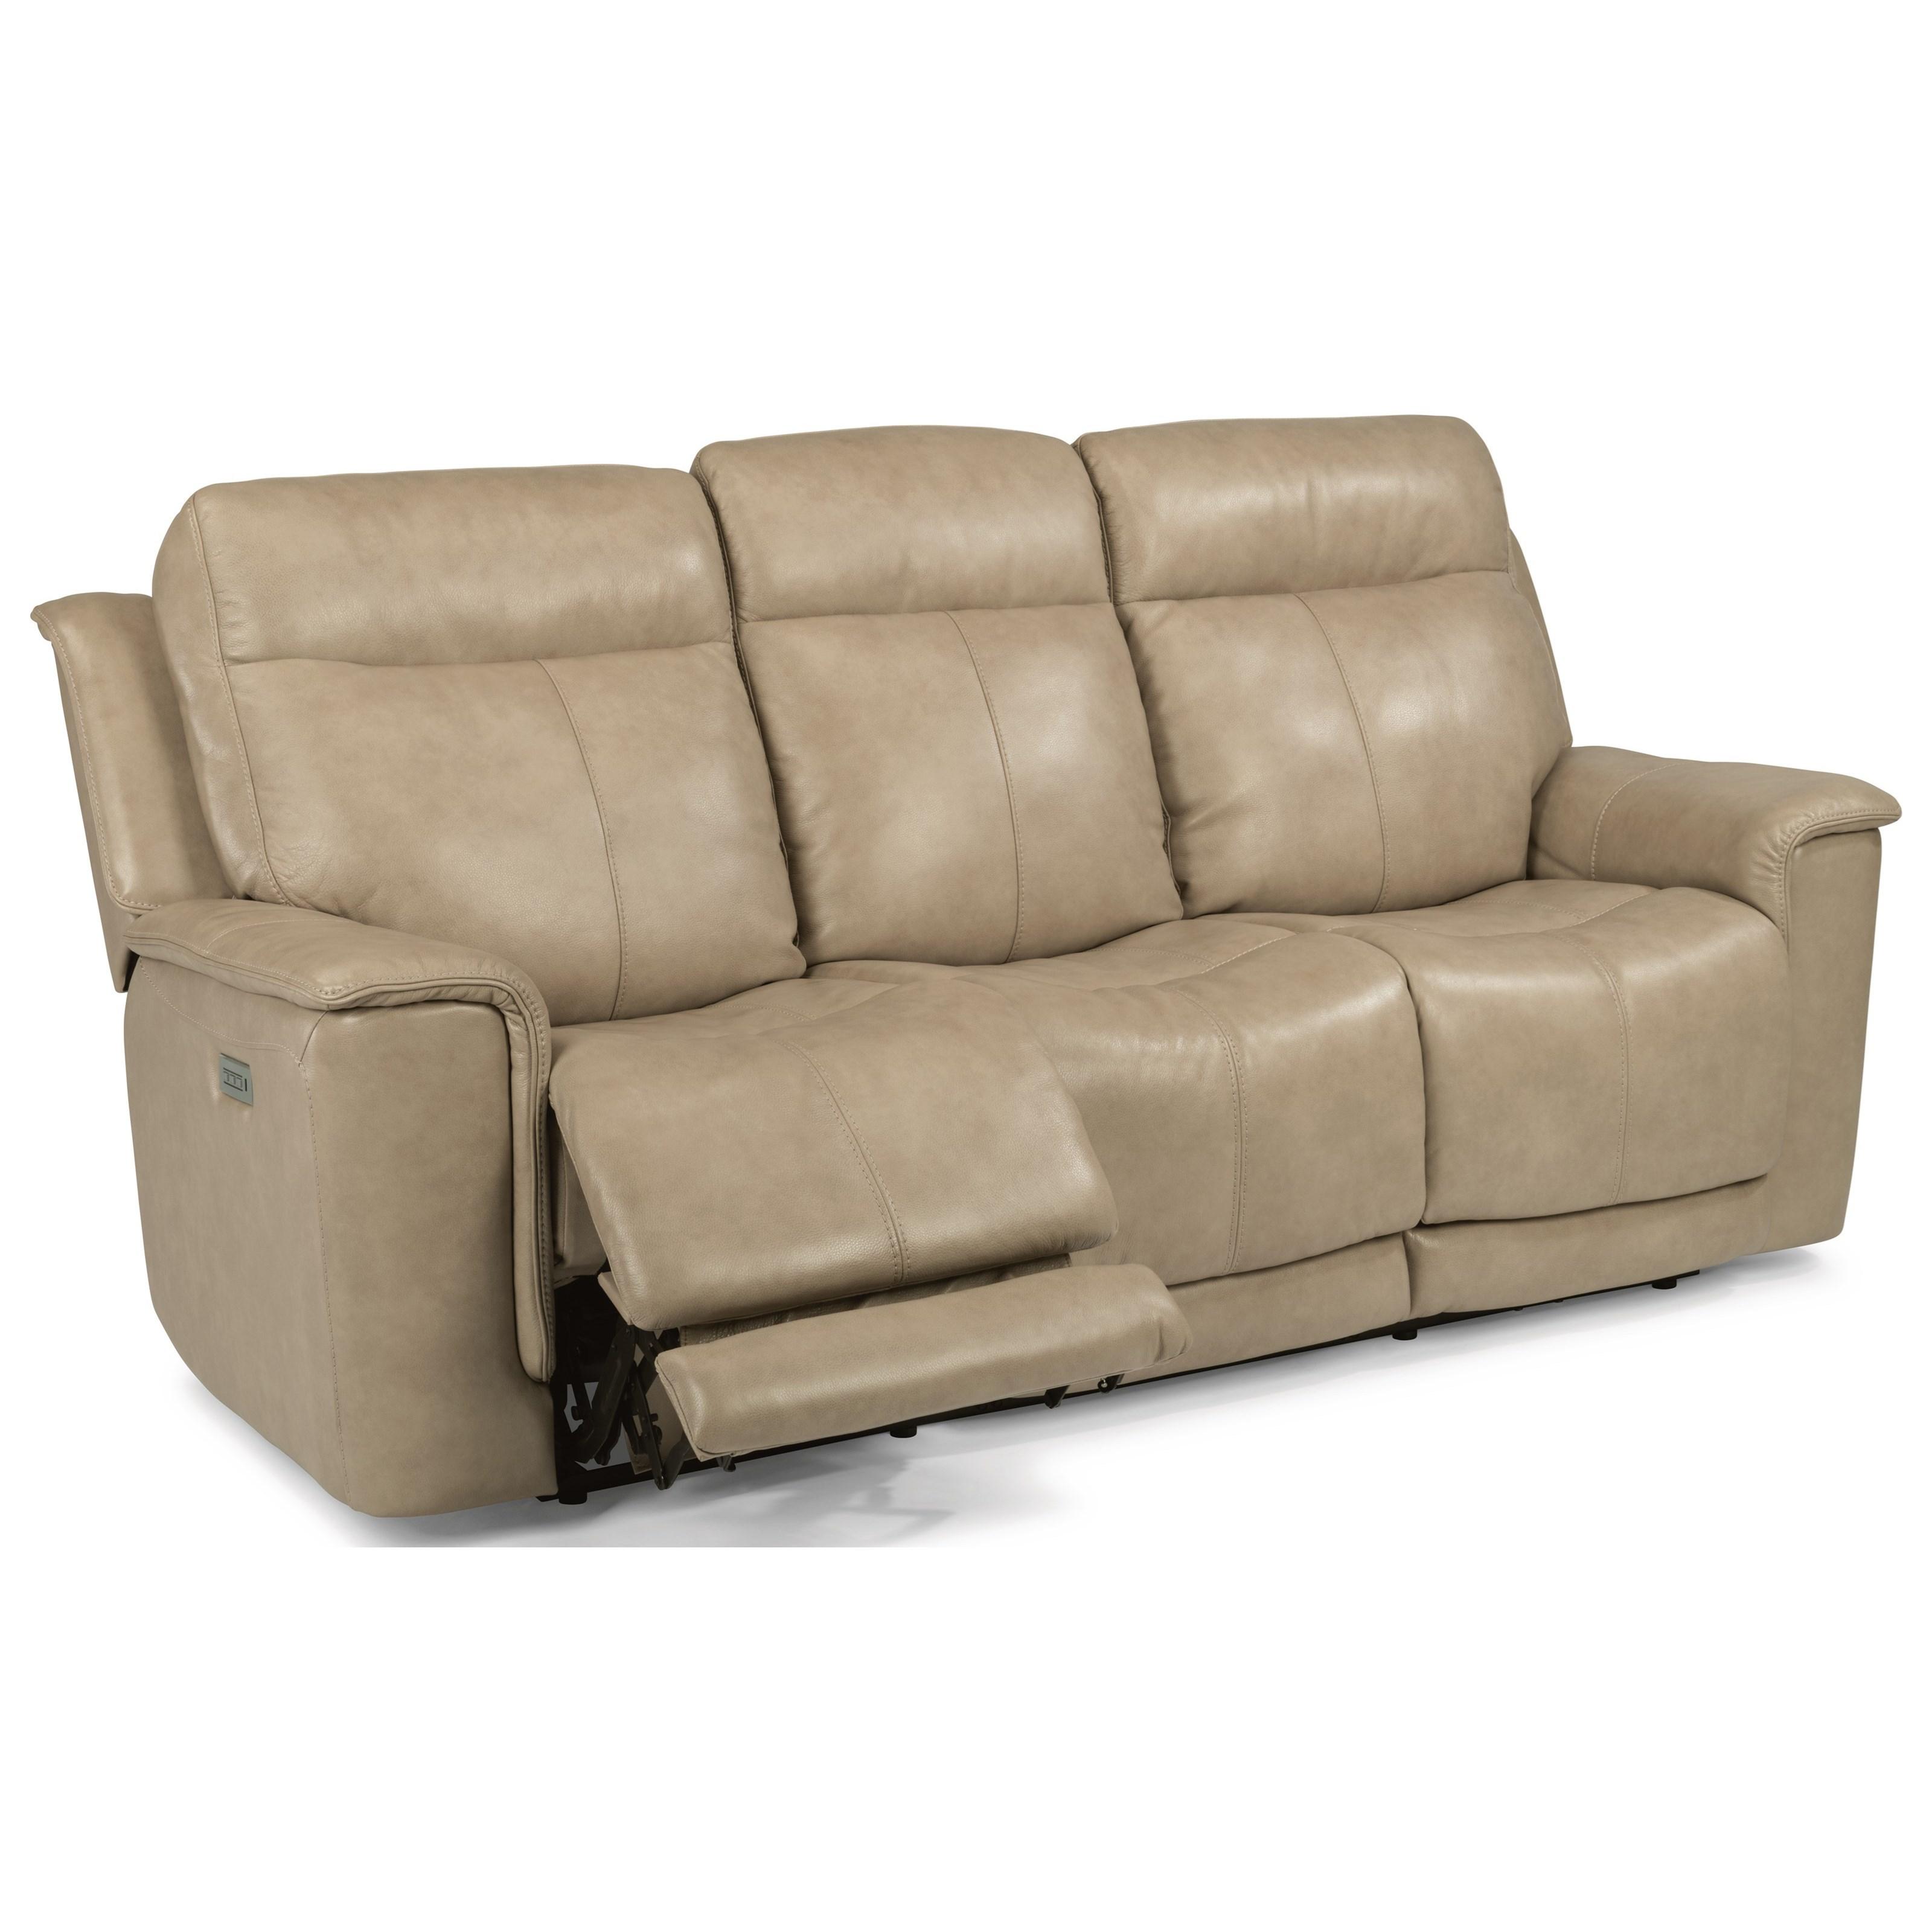 flexsteel julio reclining sofa convertible in french recliner living room field